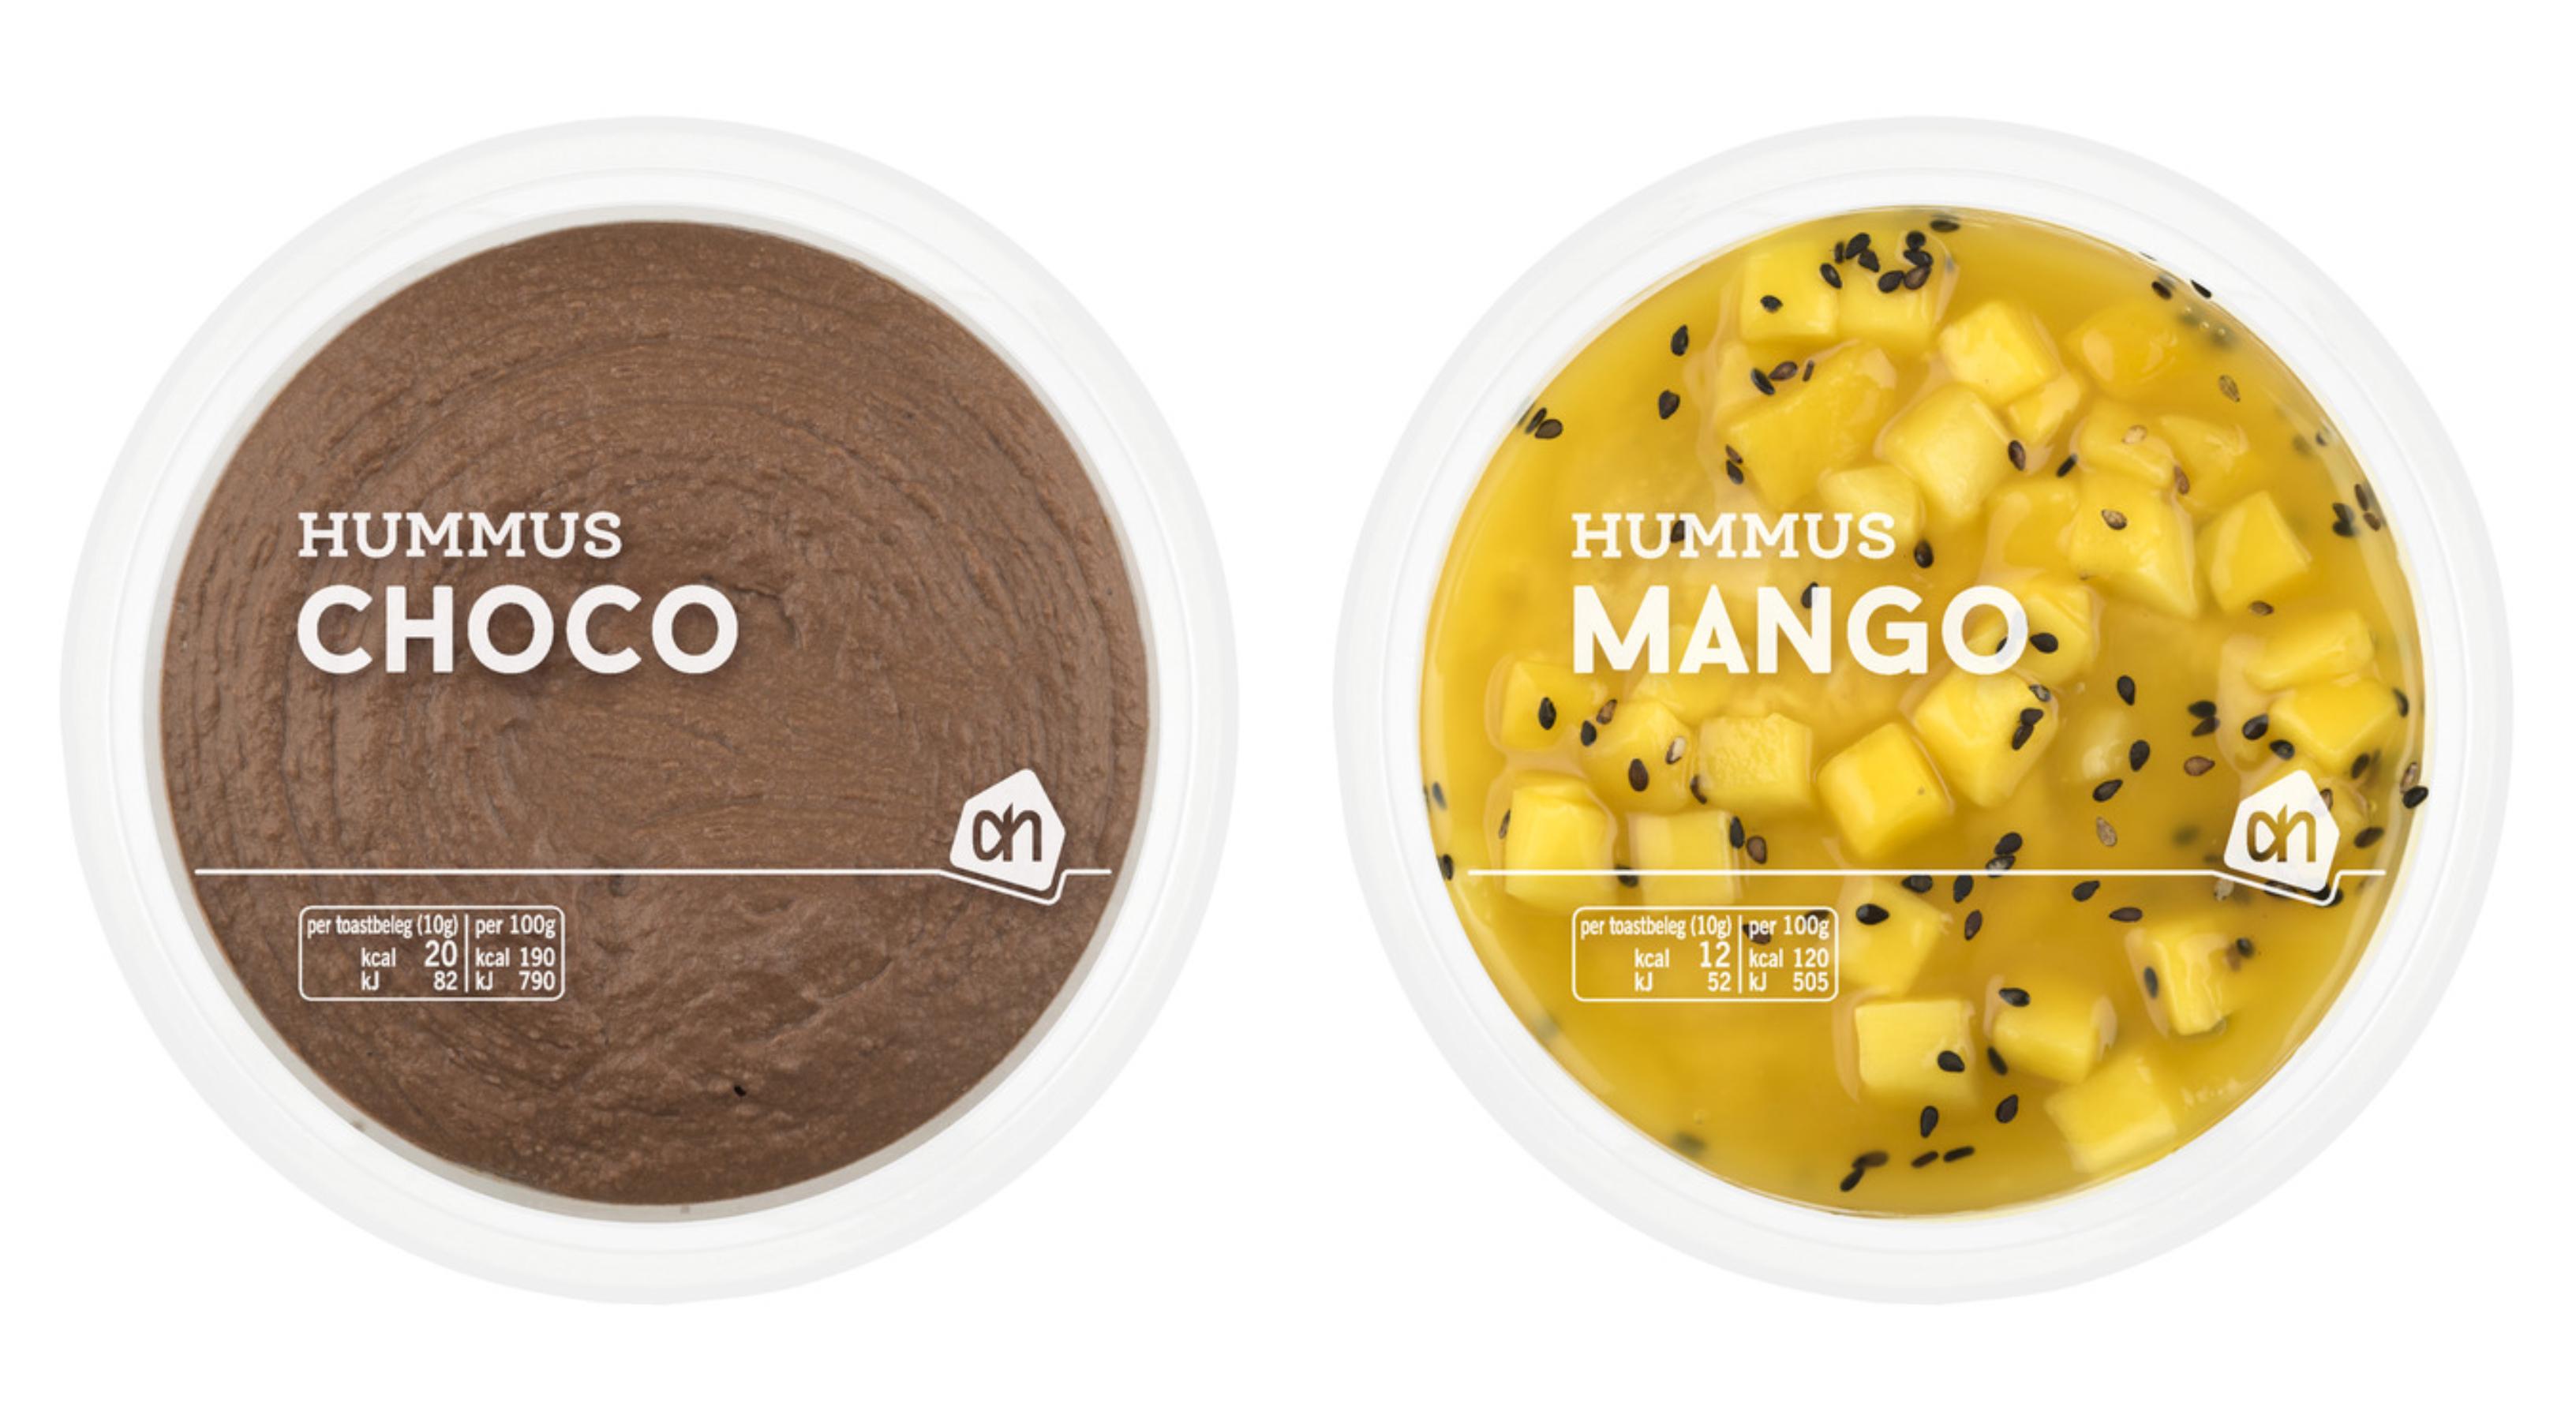 hummus, smaken, choco, mango, ah